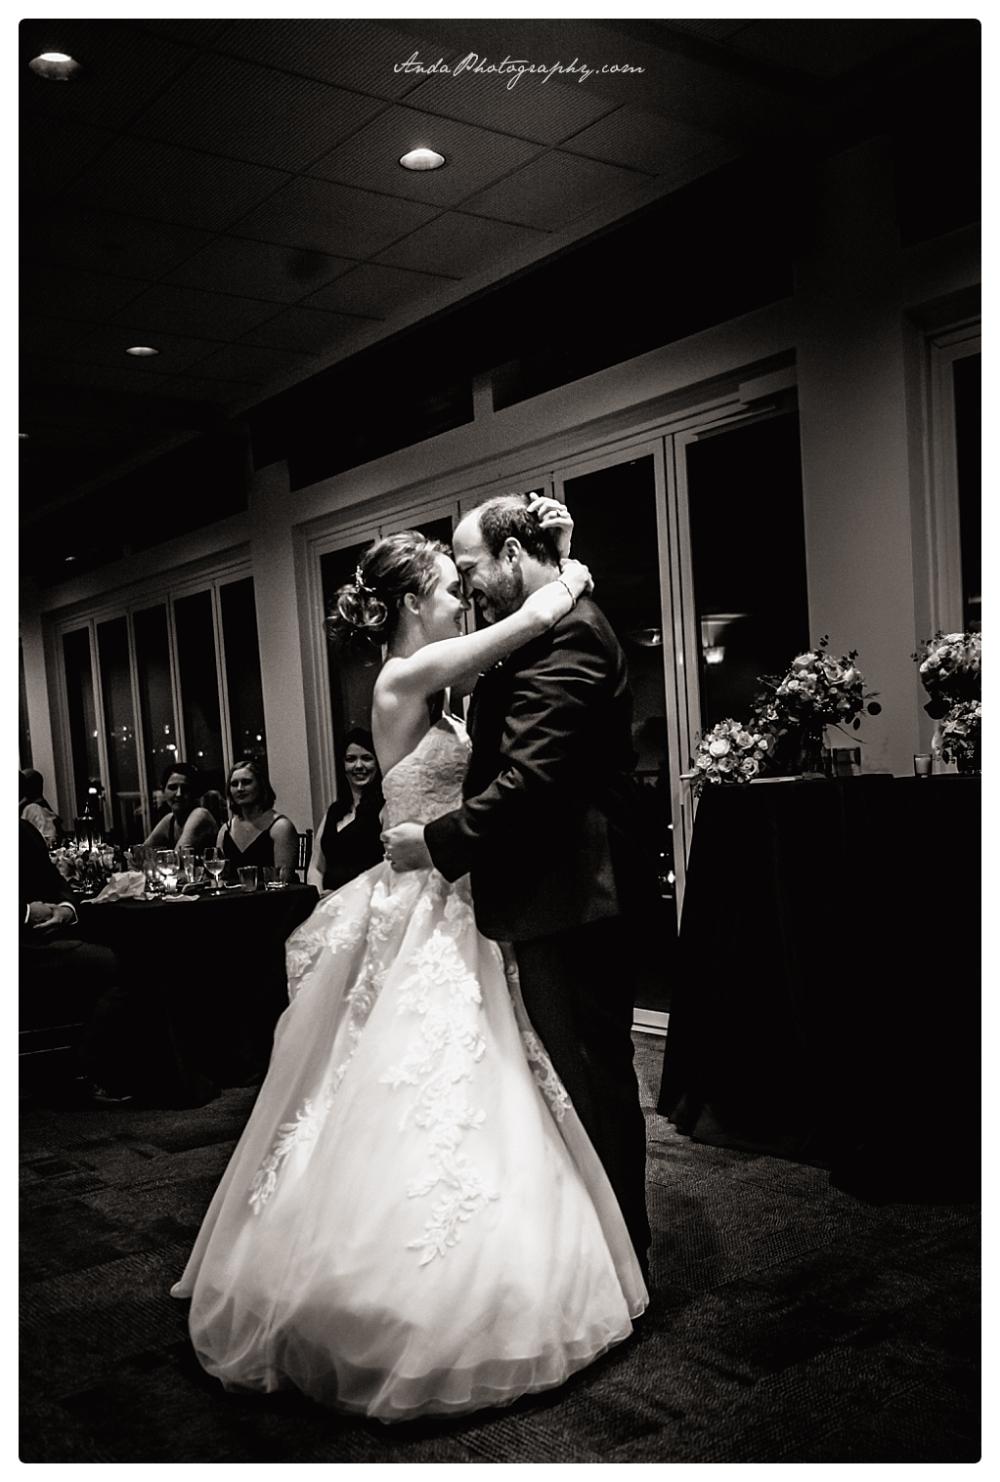 Anda Photography Bellingham wedding photographer Bellingham Yacht Club Wedding lifestyle wedding photographer Seattle Wedding Photographer_0064